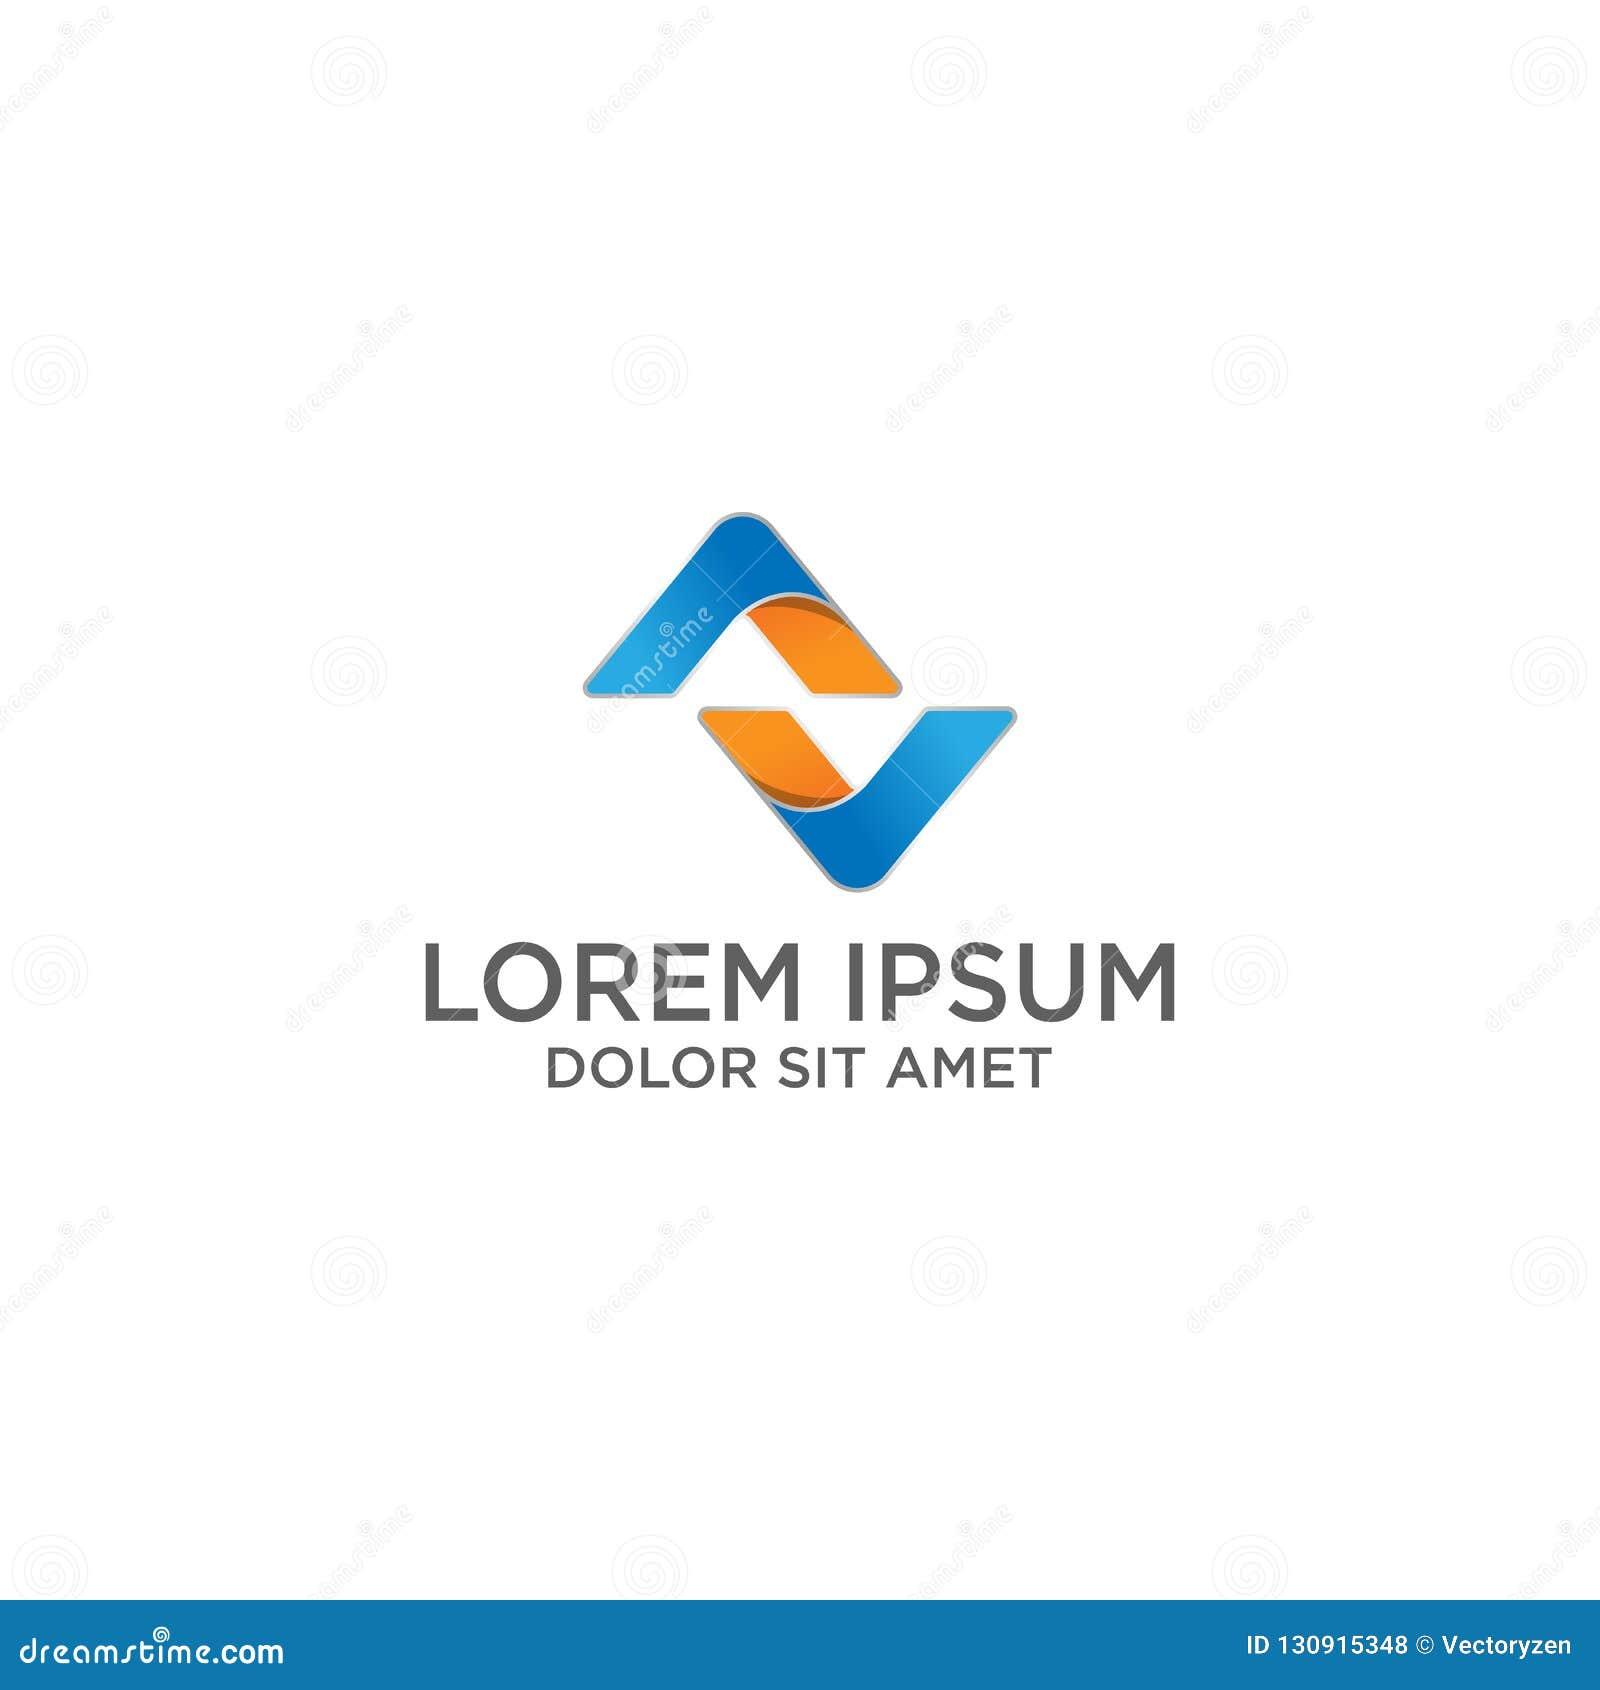 creative minimal AV logo icon design in vector illustrator format with abstract design template